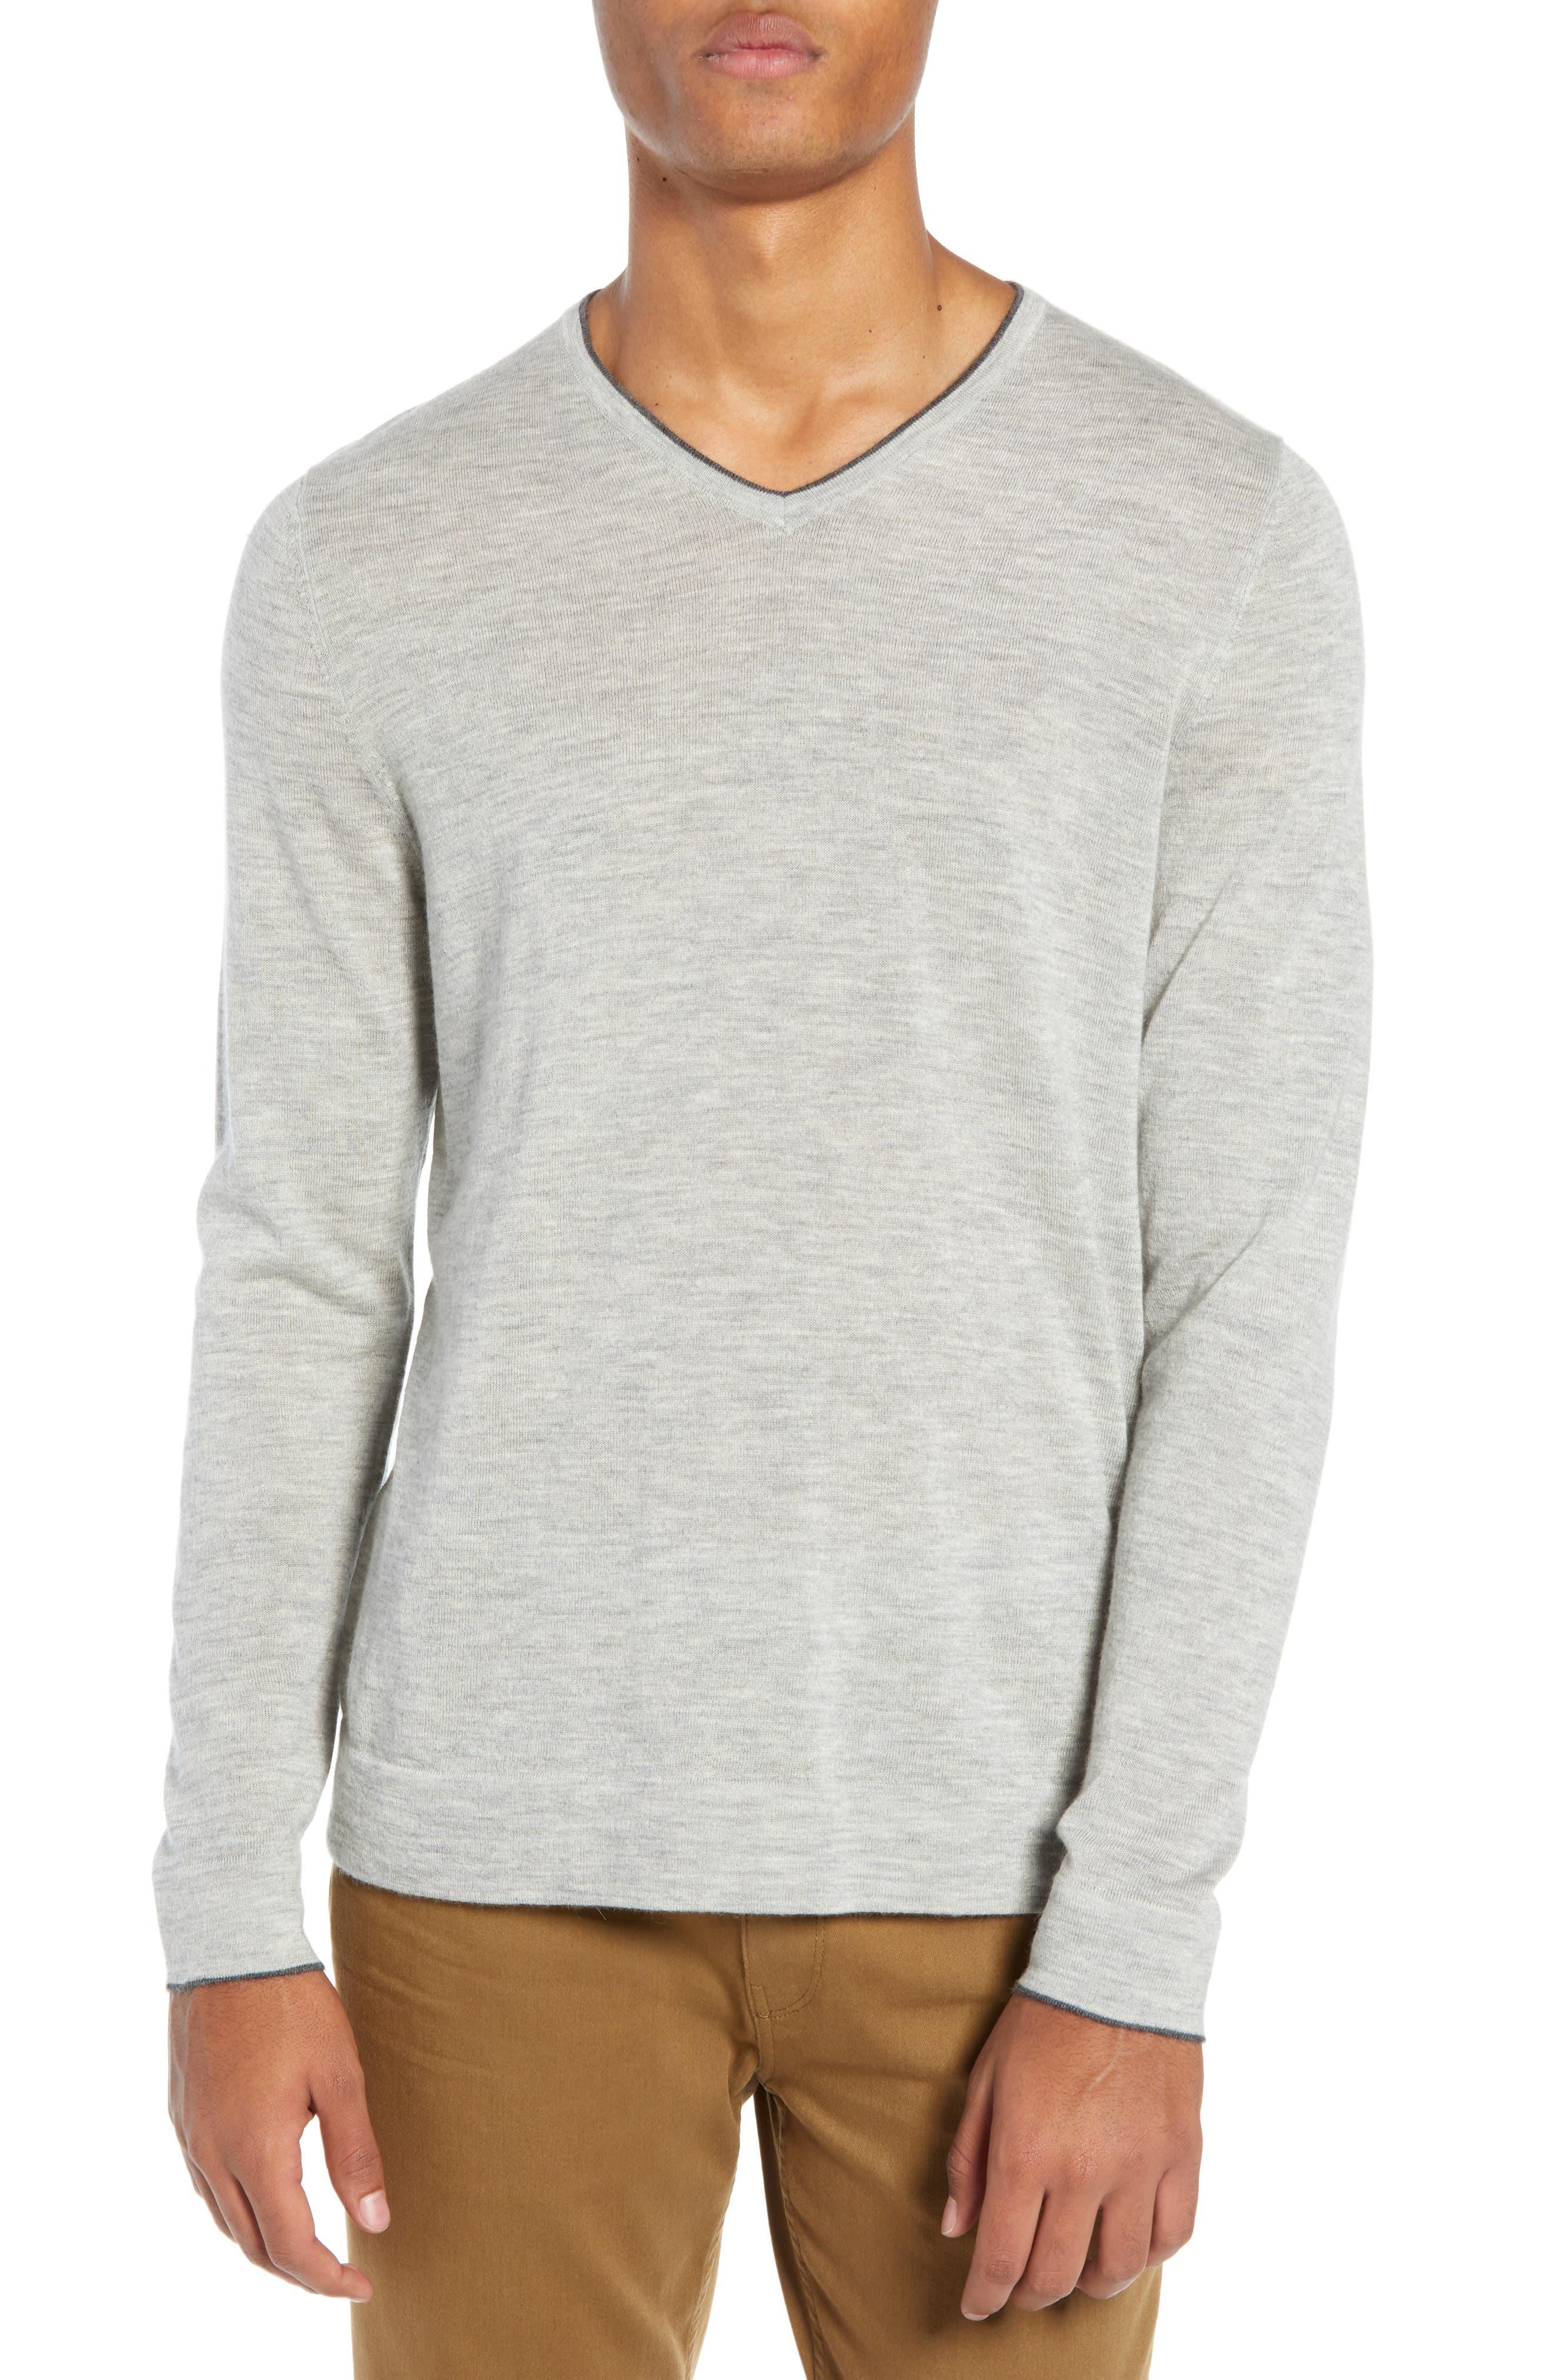 NORDSTROM SIGNATURE Cashmere V-Neck Sweater, Main, color, 050